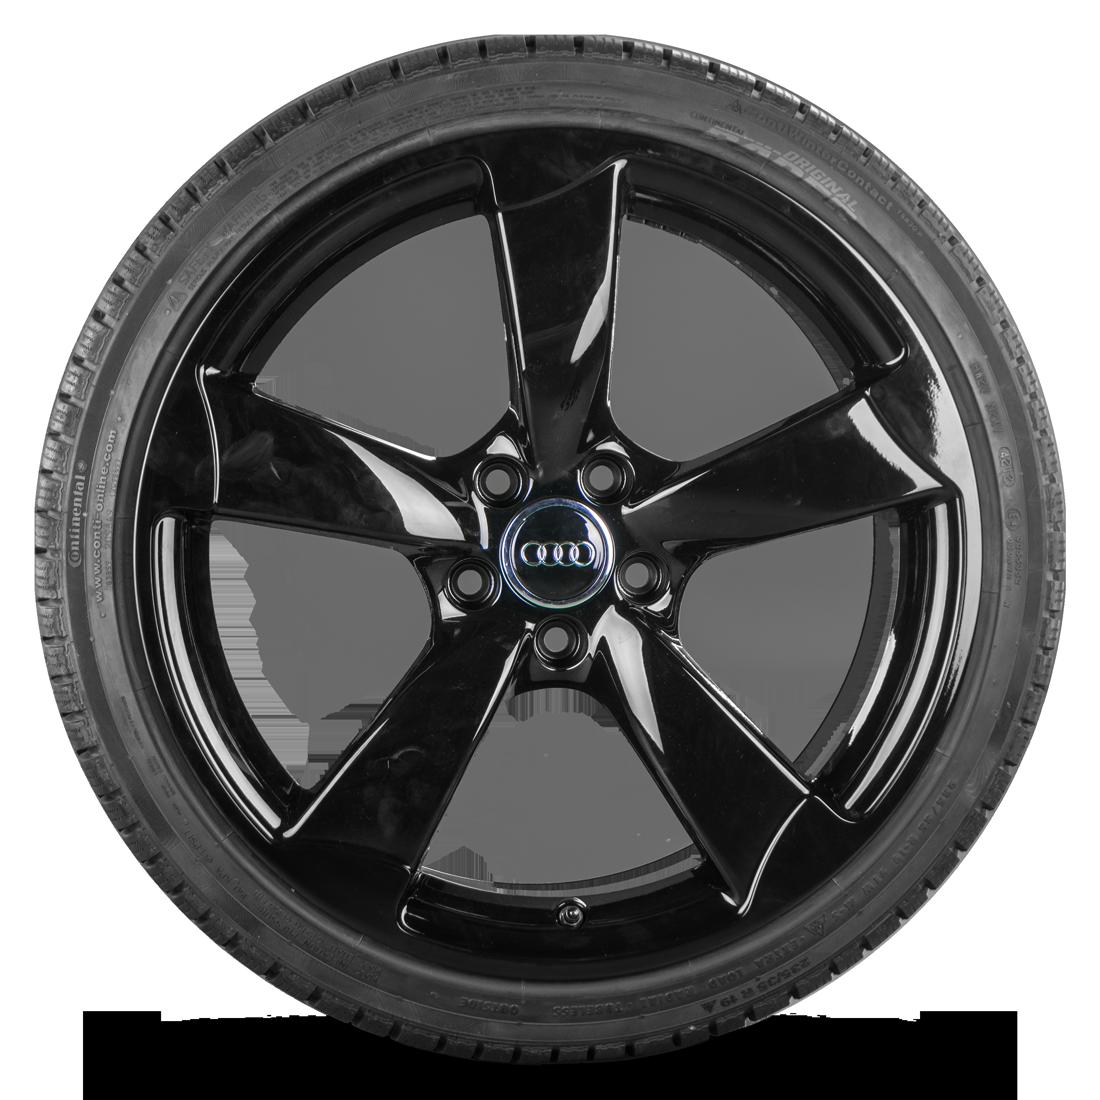 Audi 19 Zoll Rotor Winterräder Felgen R8 V8 V10 Winterreifen schwarz Neuwertig